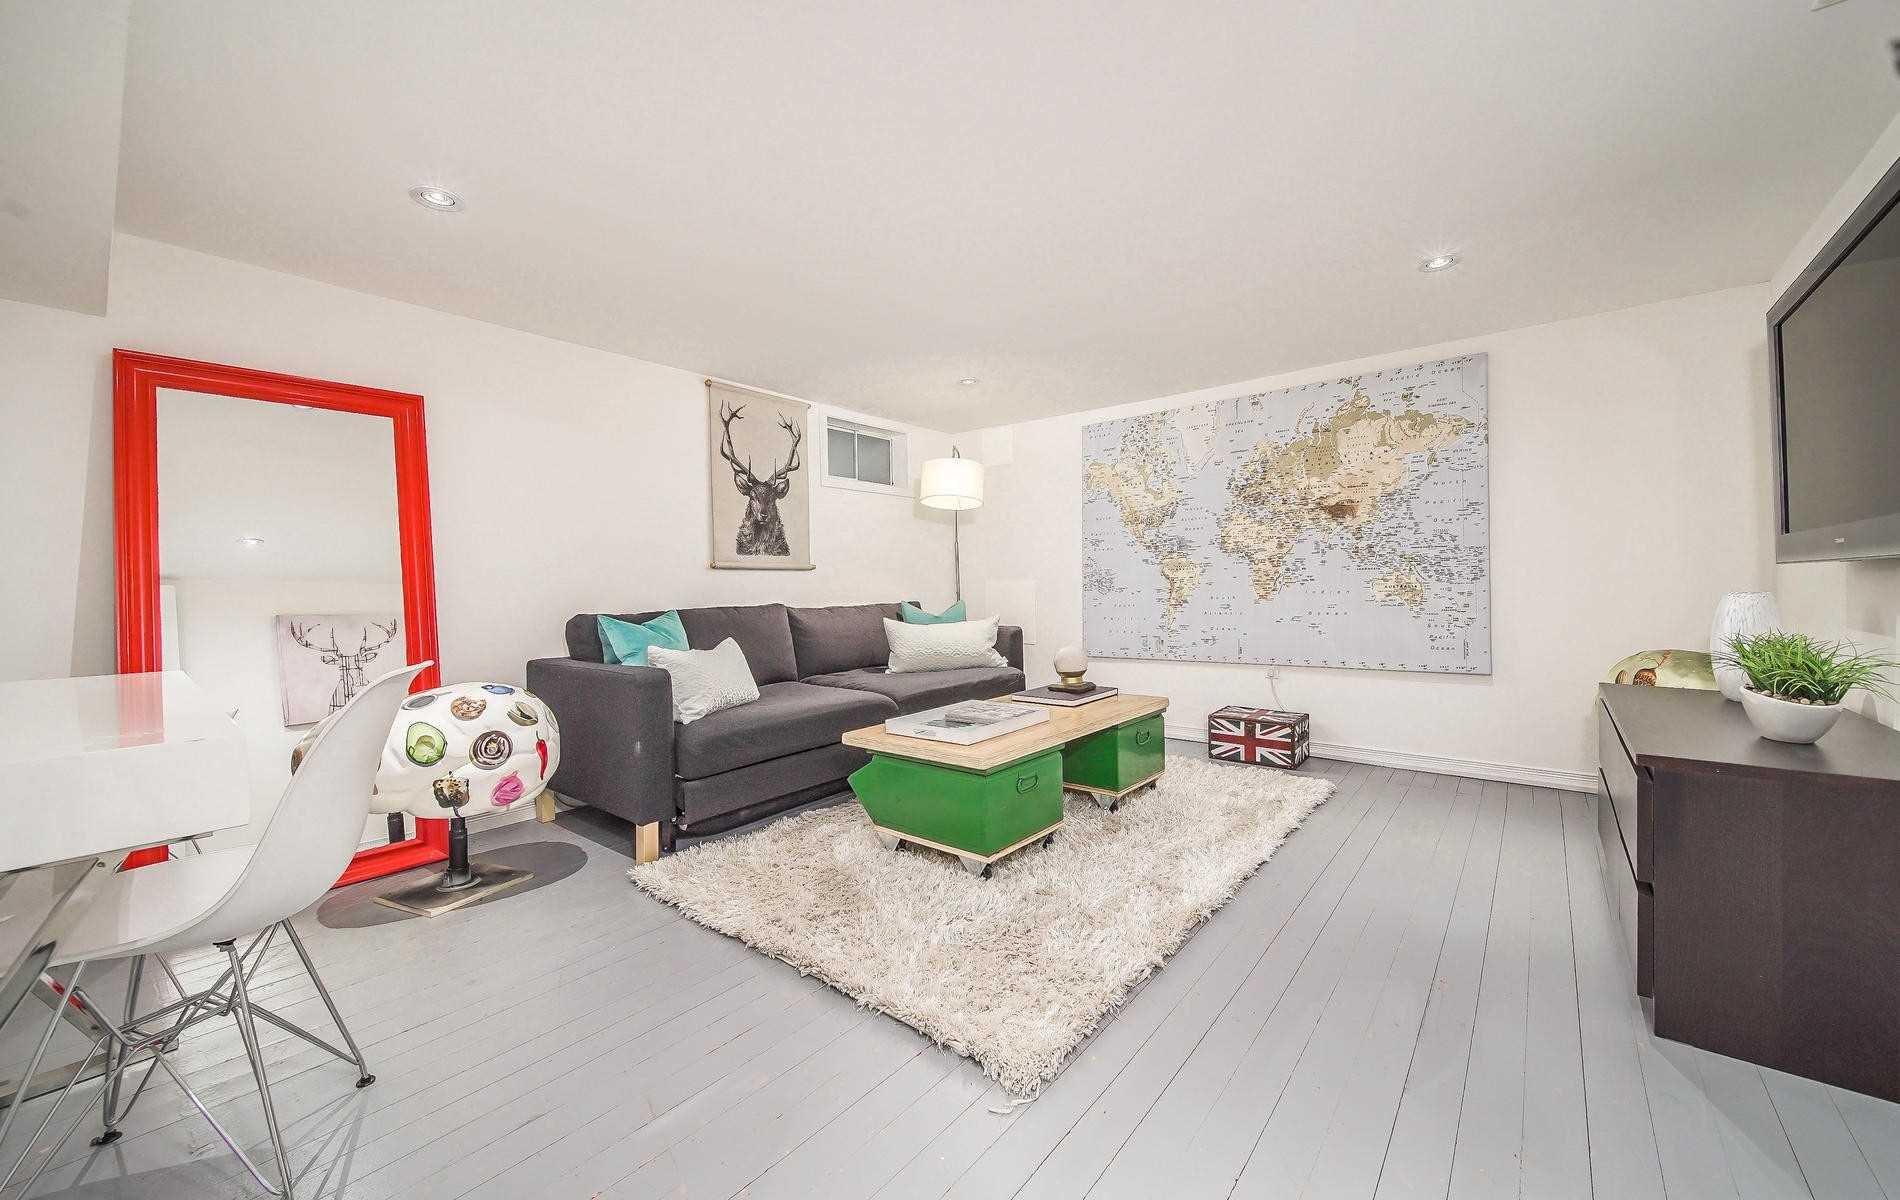 Photo 17: Photos: 64 Larchmount Avenue in Toronto: South Riverdale House (2-Storey) for sale (Toronto E01)  : MLS®# E4489752